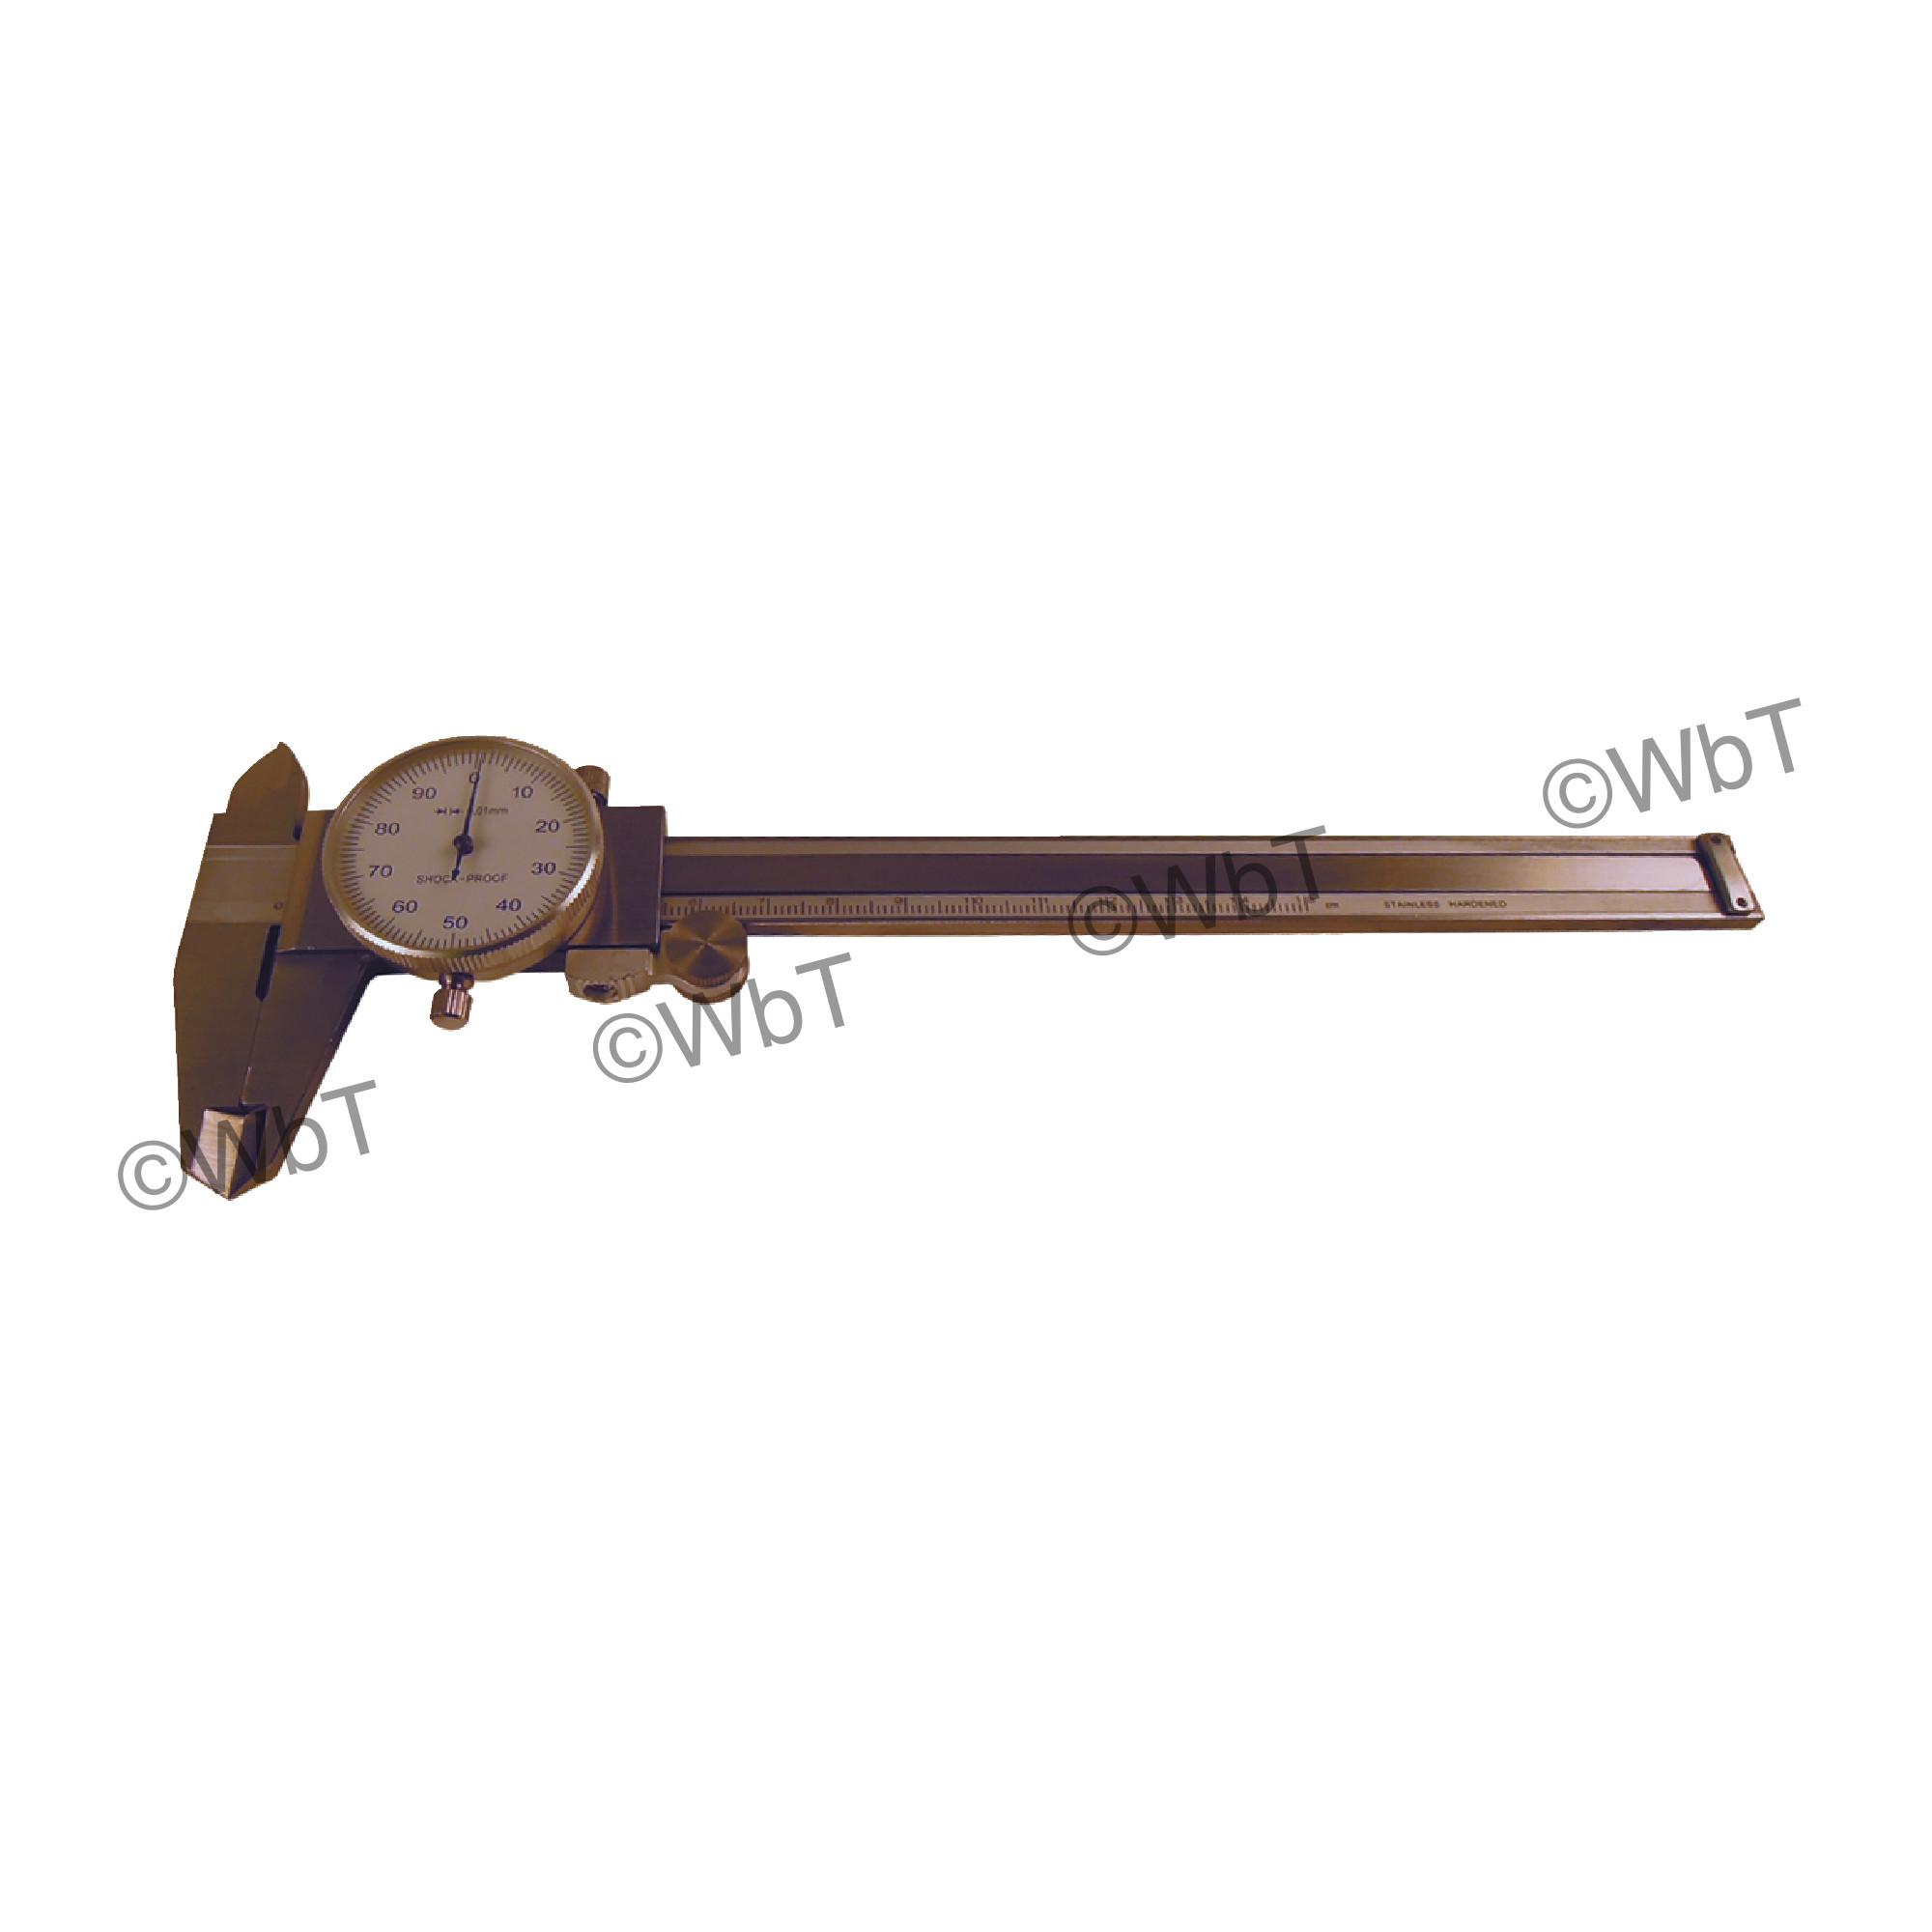 150mm Precision Dial Caliper